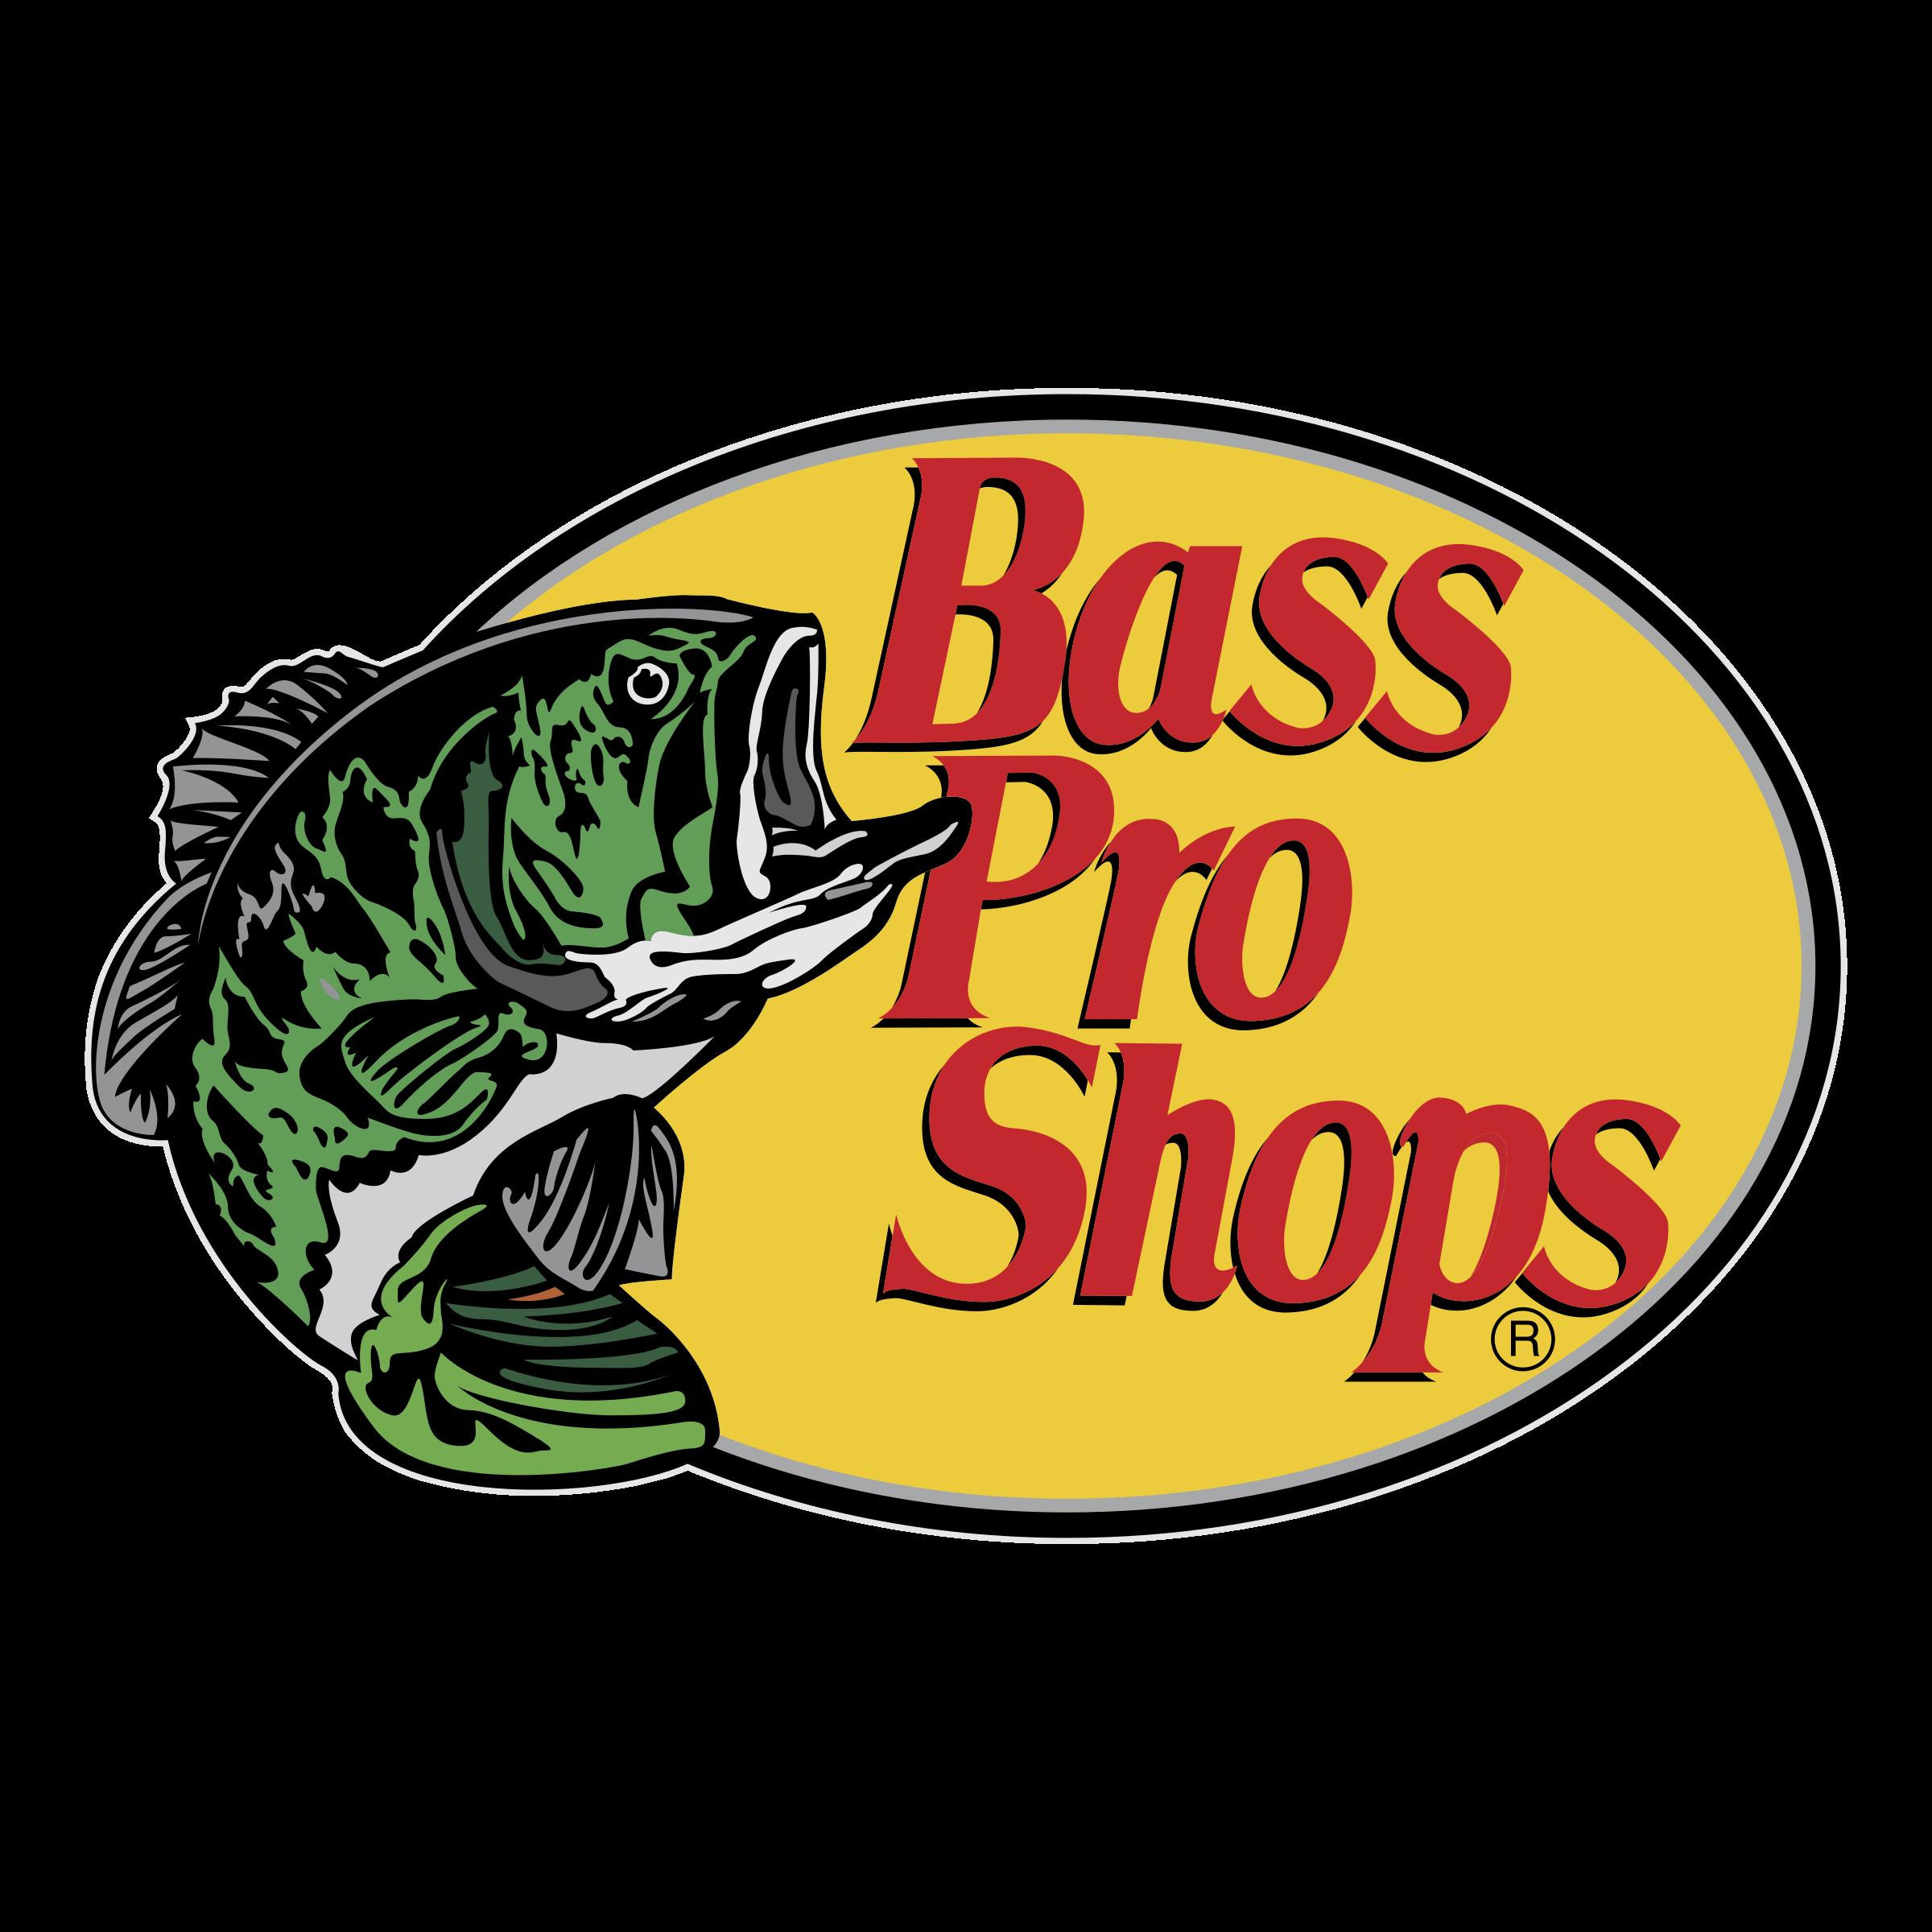 Bass Pro Shops 01 Logo Png Transparent Svg Vector Freebie Supply